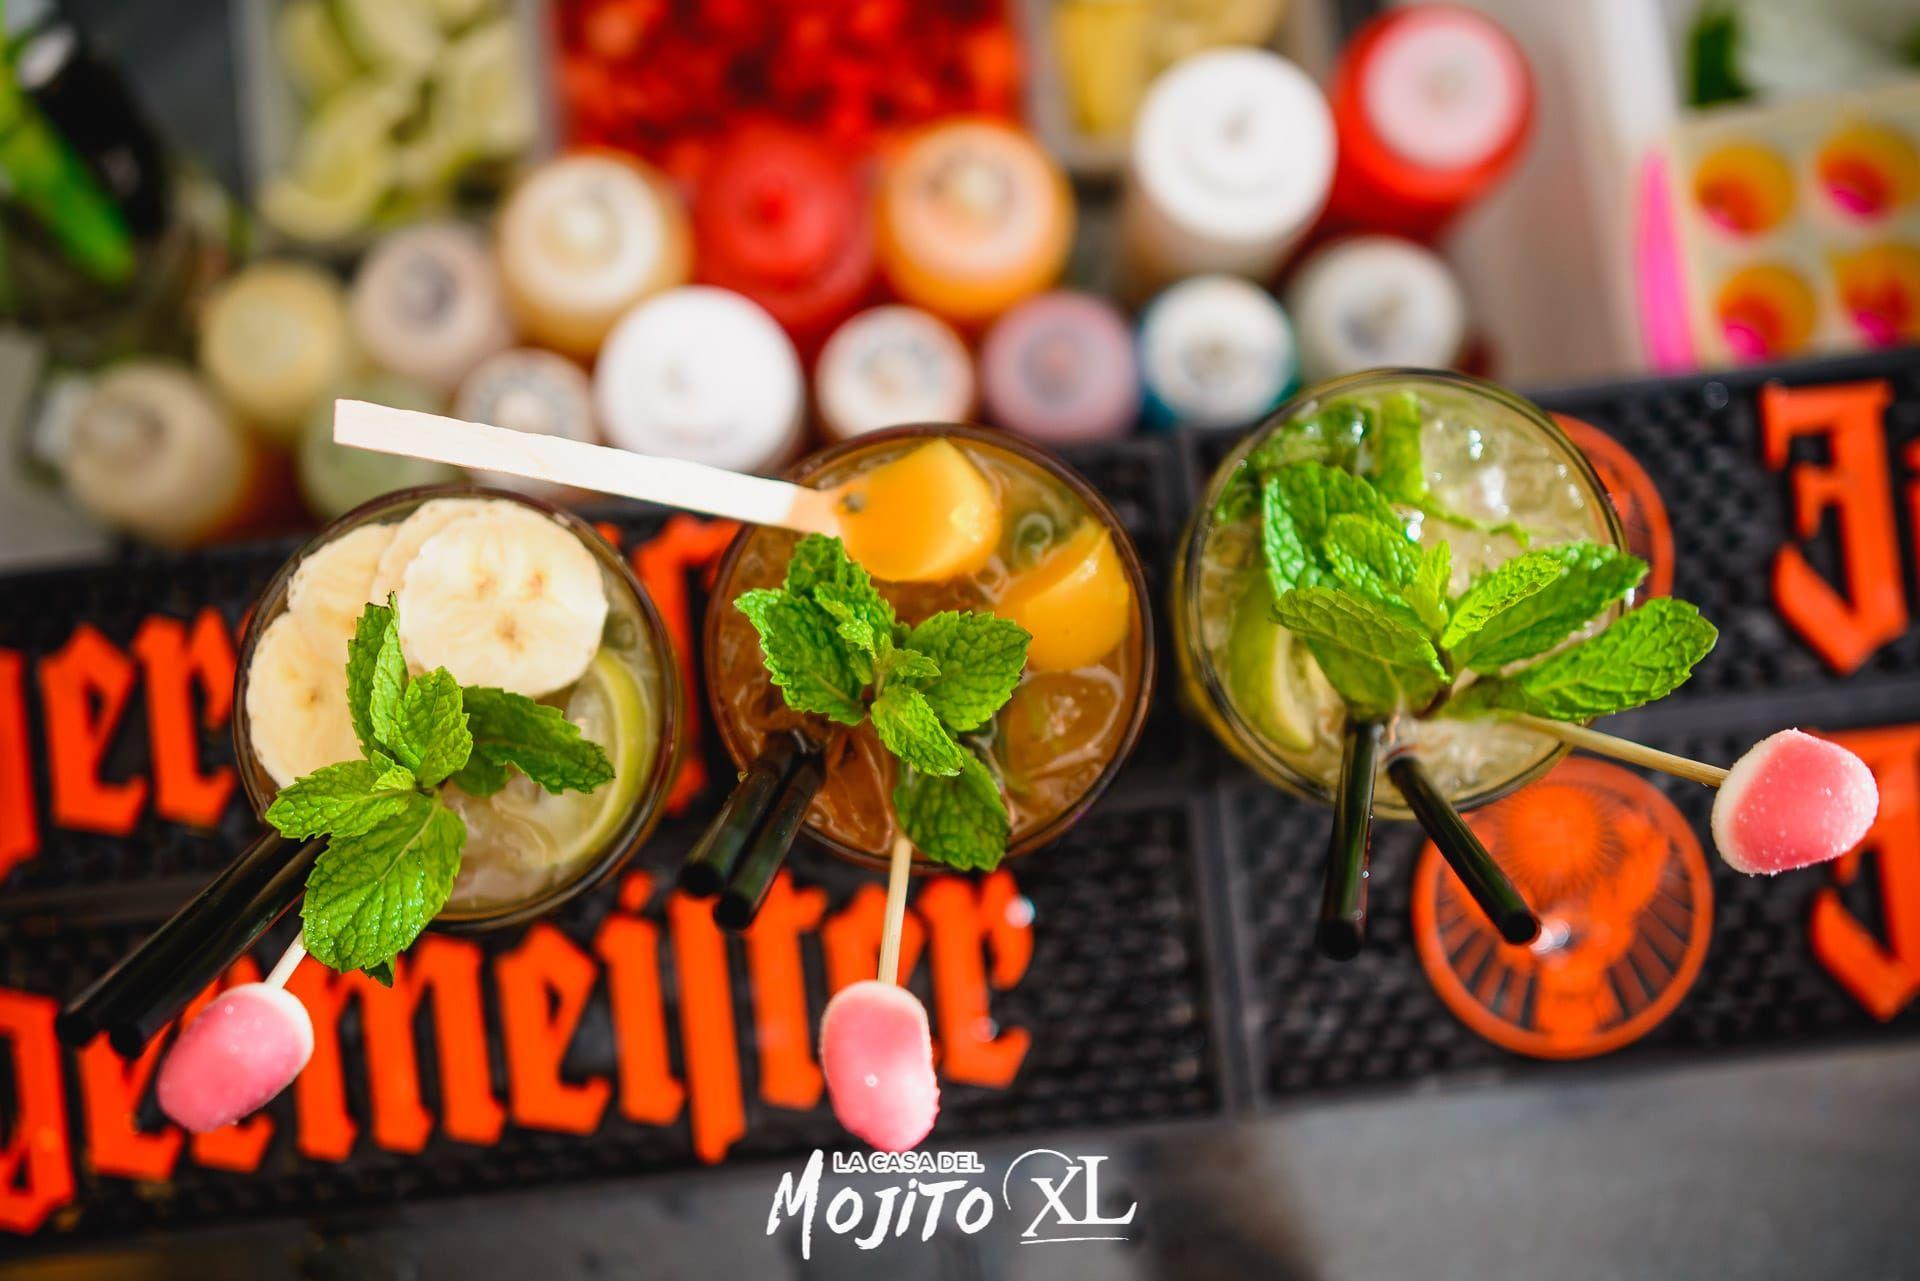 The best mojitos in Los Cristianos